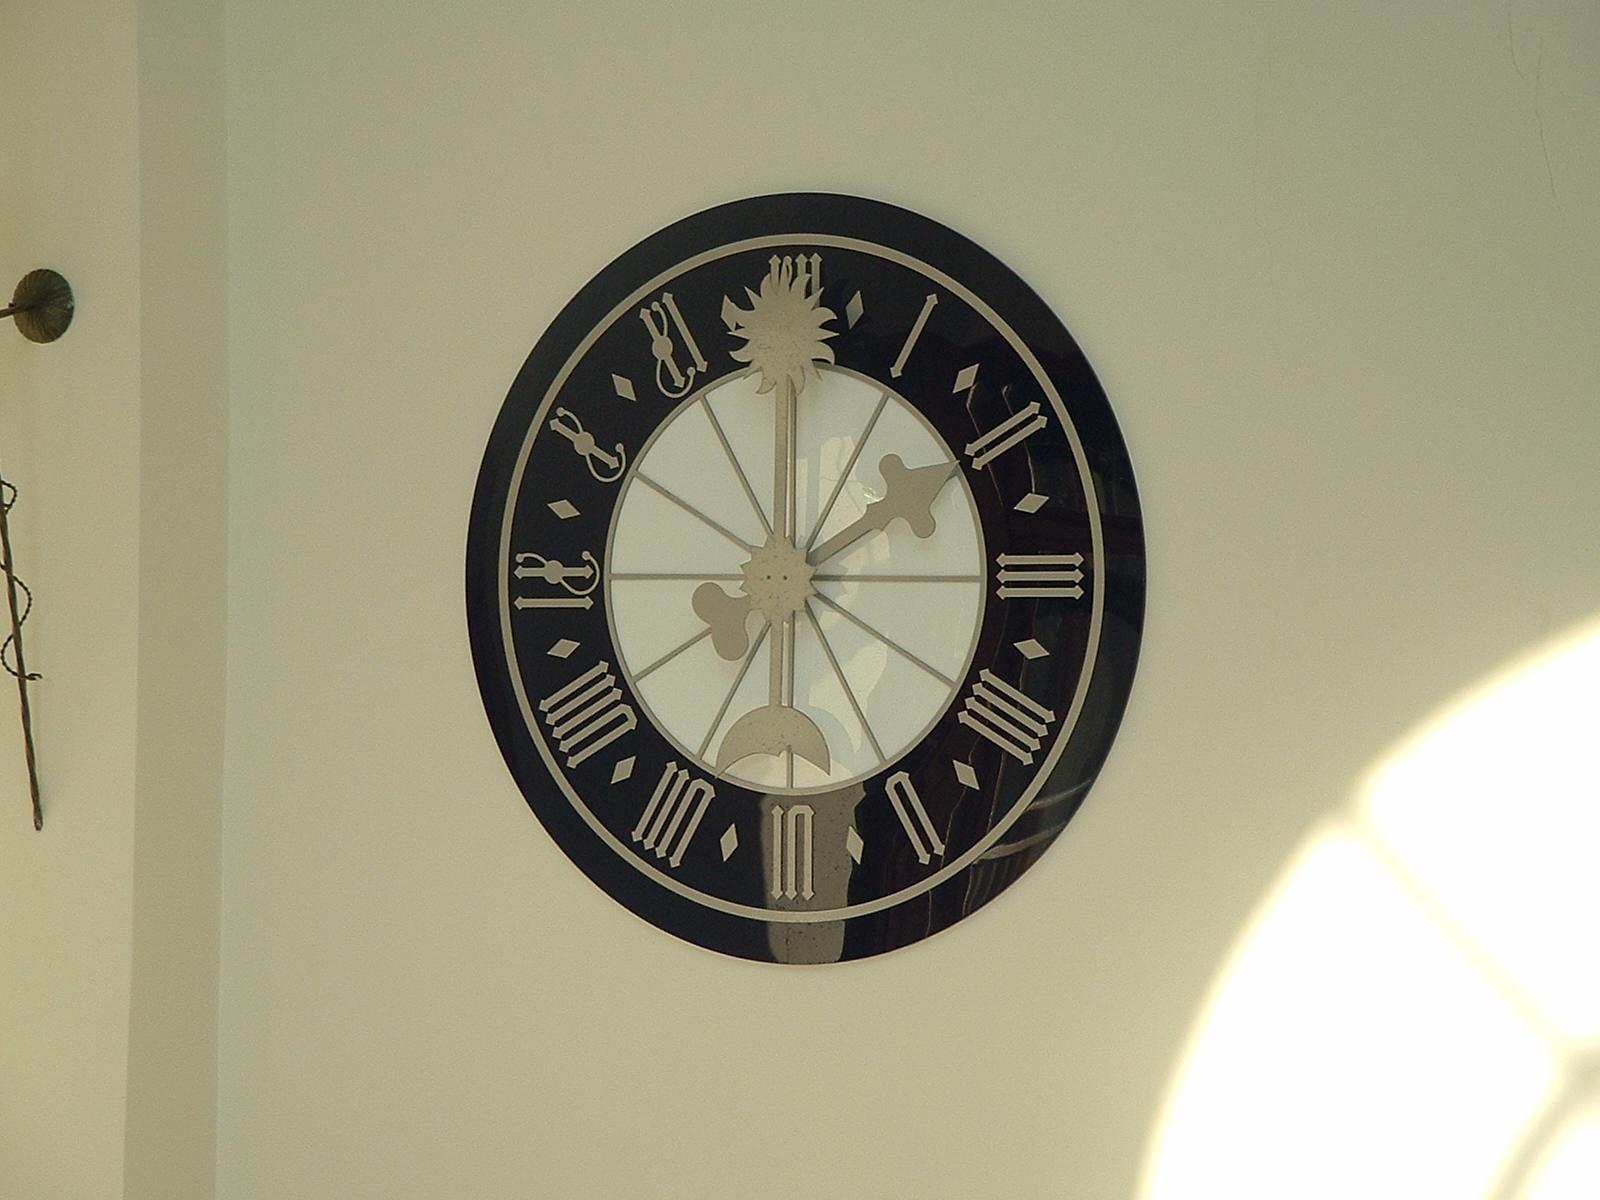 Medieval clock in swimming pool